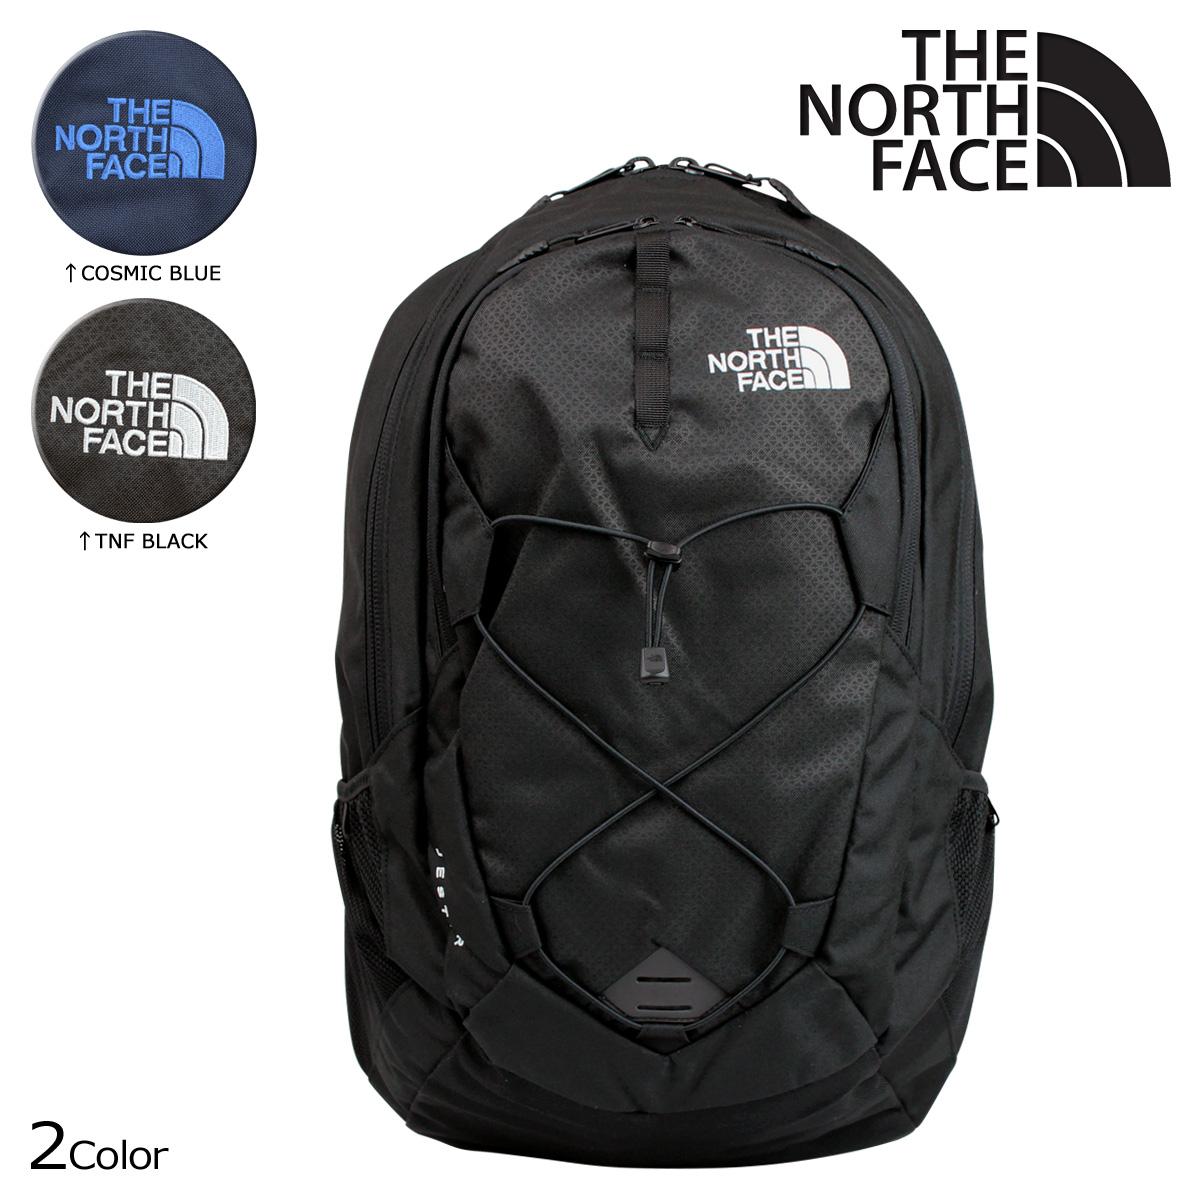 eb1df7ee5 THE NORTH FACE JESTER BACKPACK 26L North Face rucksack backpack men gap Dis  [194]